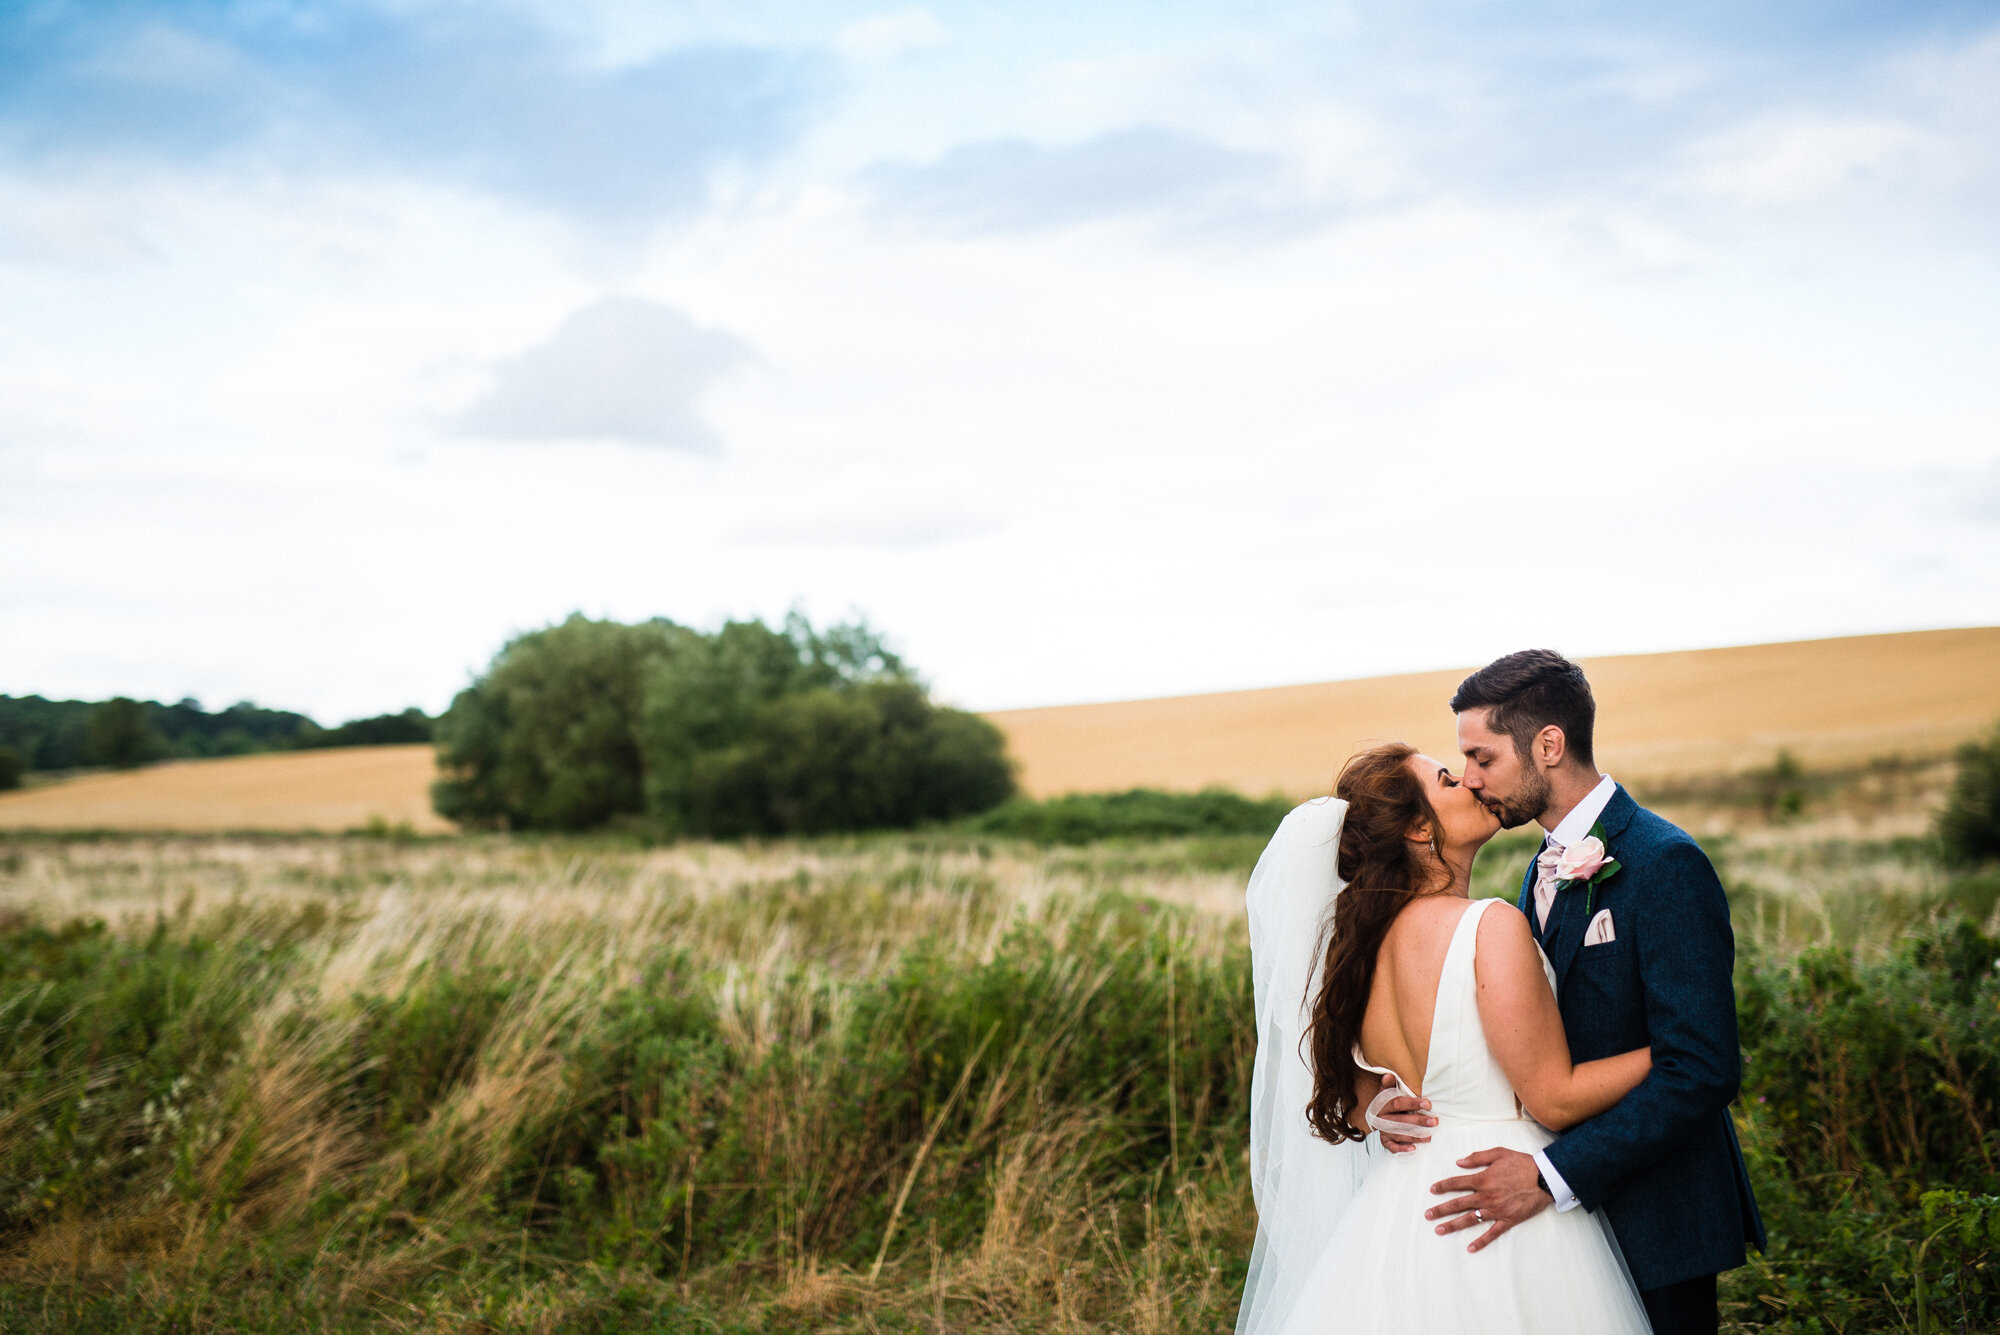 Nottingham wedding photographer19.jpg